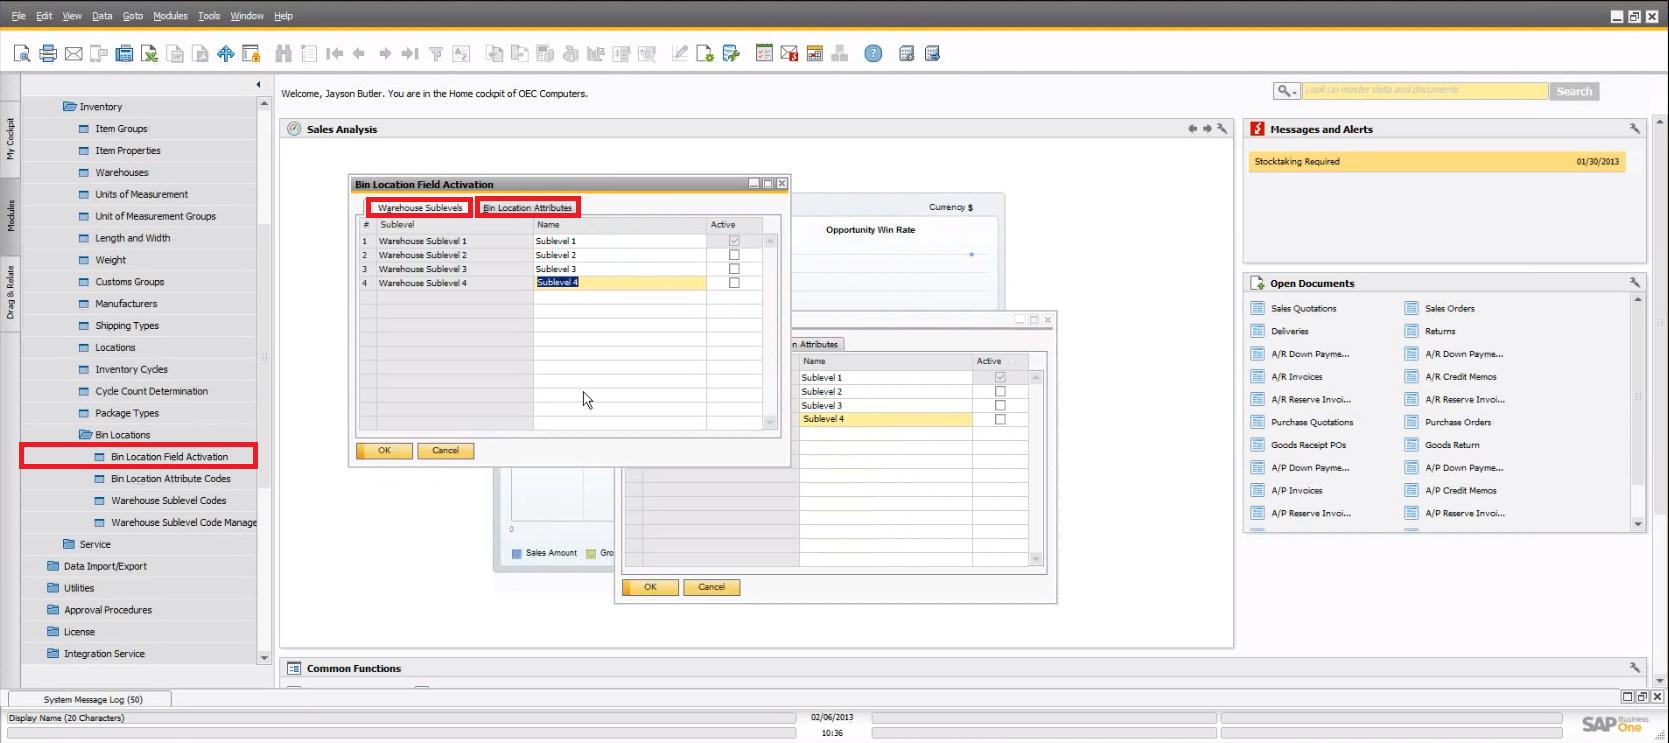 SAP Business One 9.0 Bin Location Activation